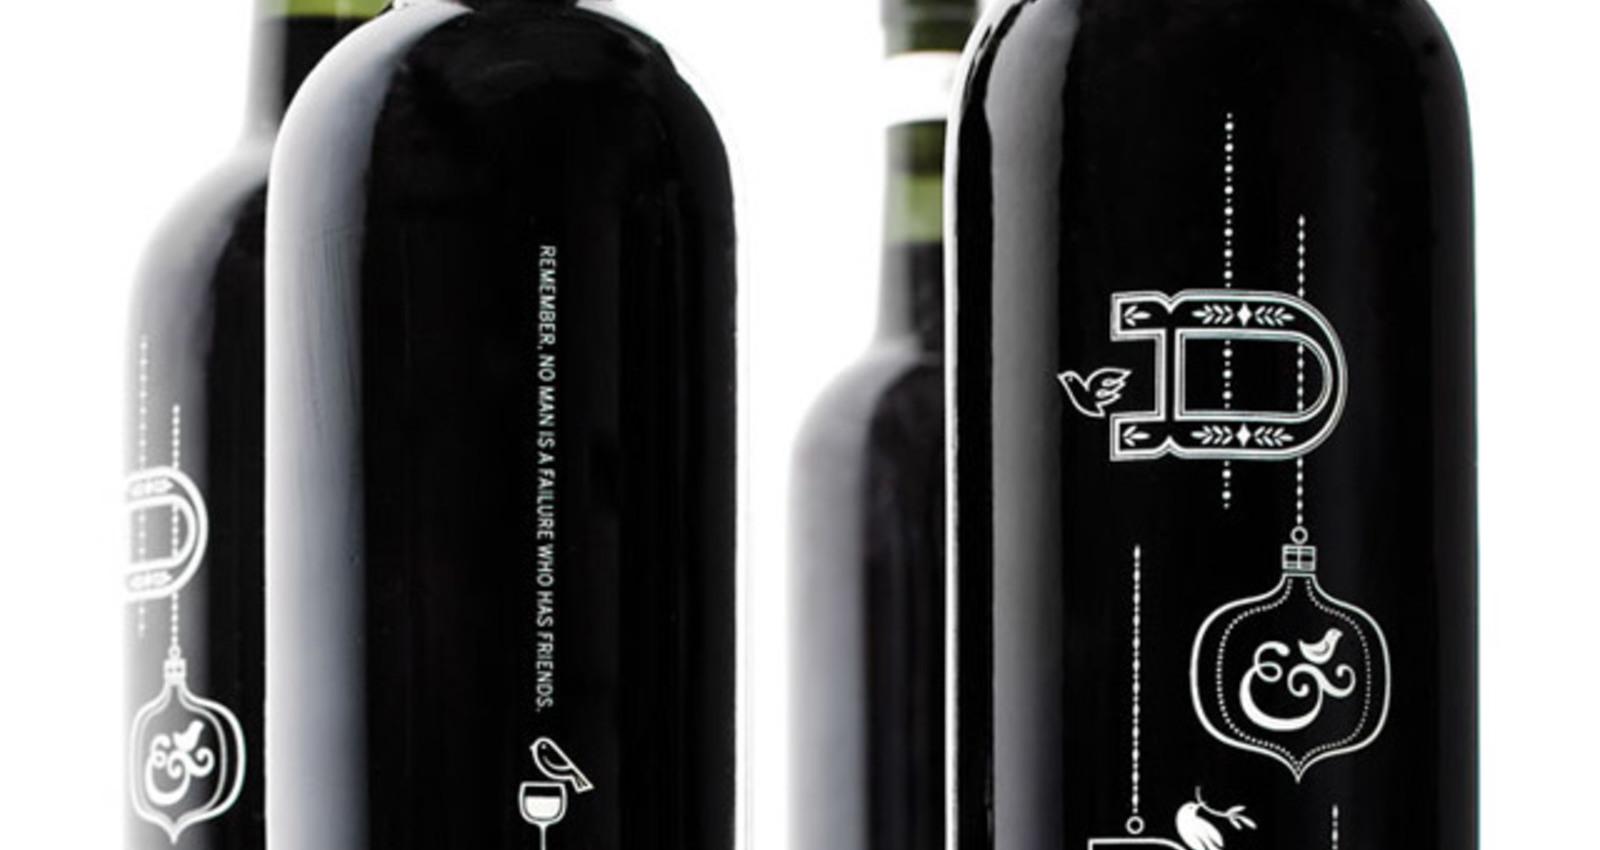 Duffy & Partners Holiday Wine Bottle